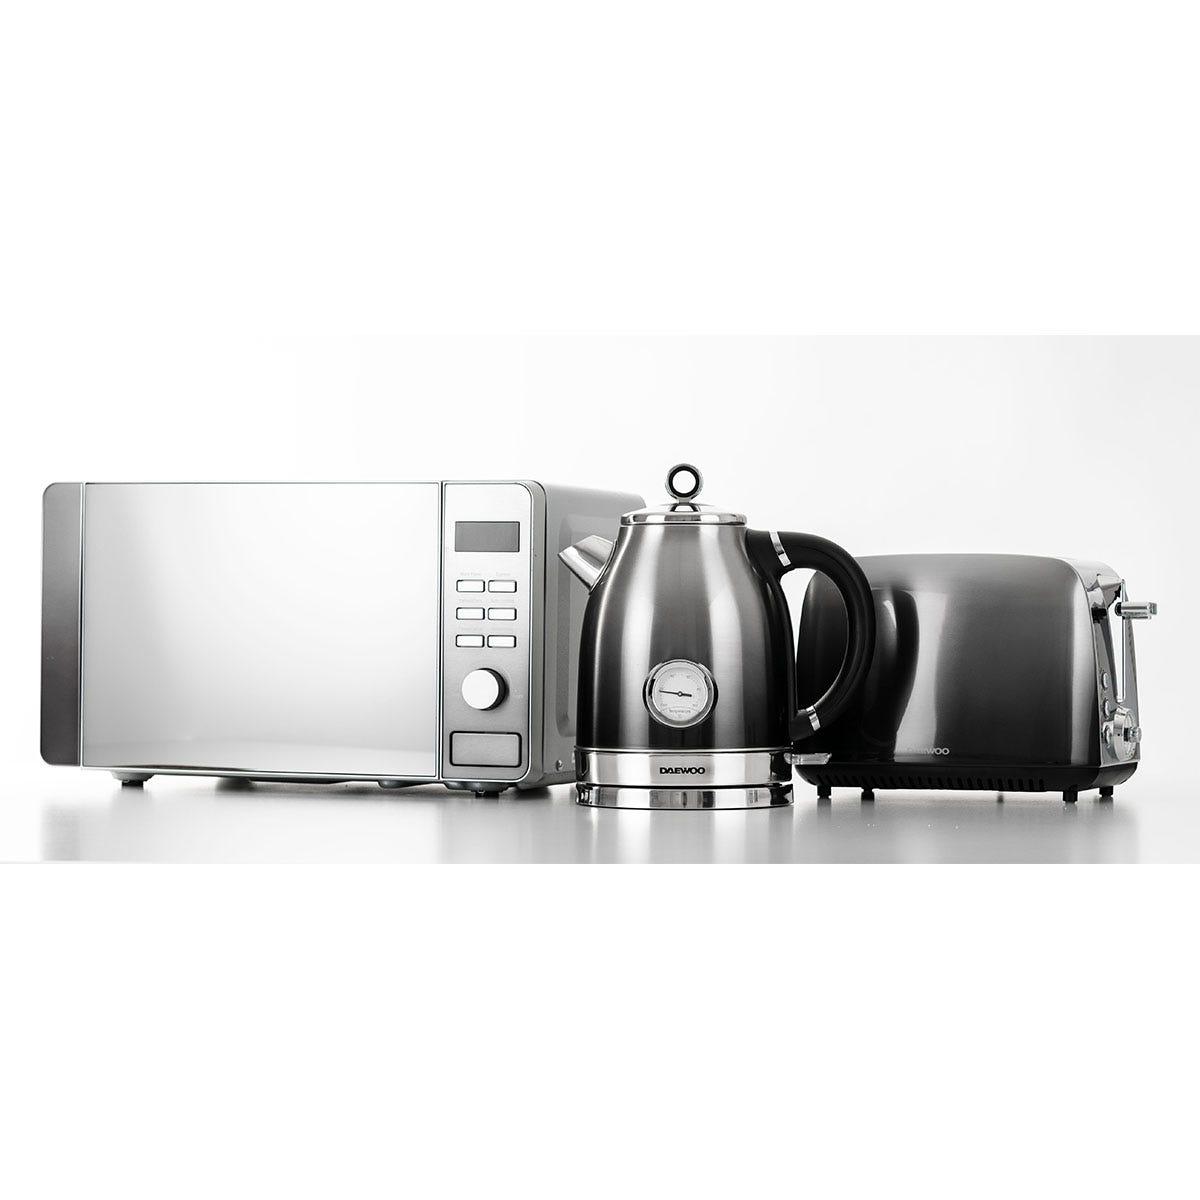 Daewoo Callisto SDA1837GE 1.7L Retro Kettle, Callisto SDA1838GE Retro 2-Slice Toaster, and Callisto SDA1873GE 20L Microwave Bundle - Silver